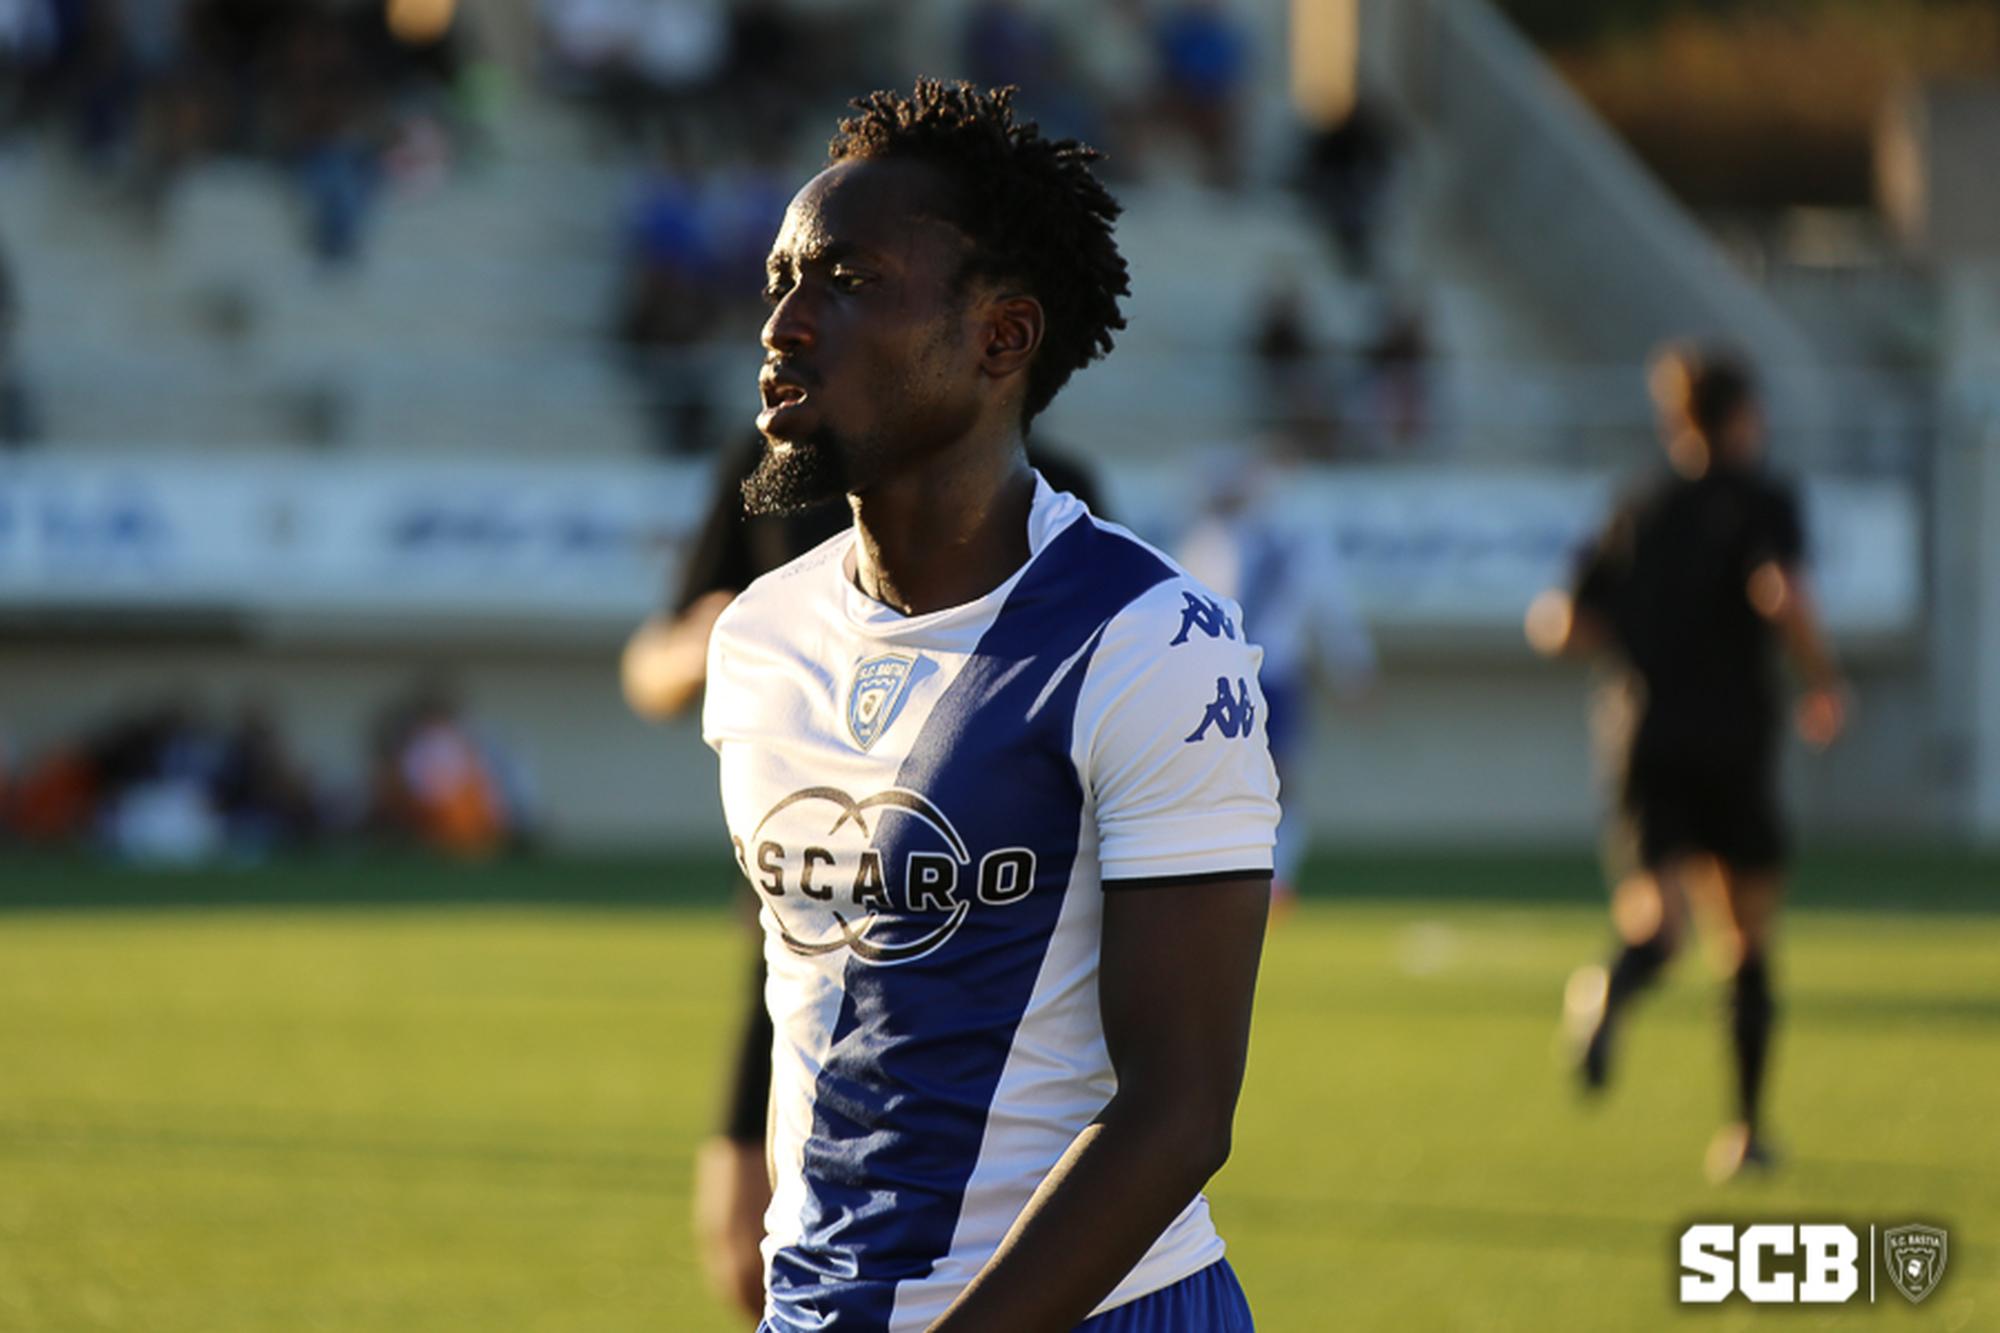 ASFA 2-0 SCB (20/09/2017)